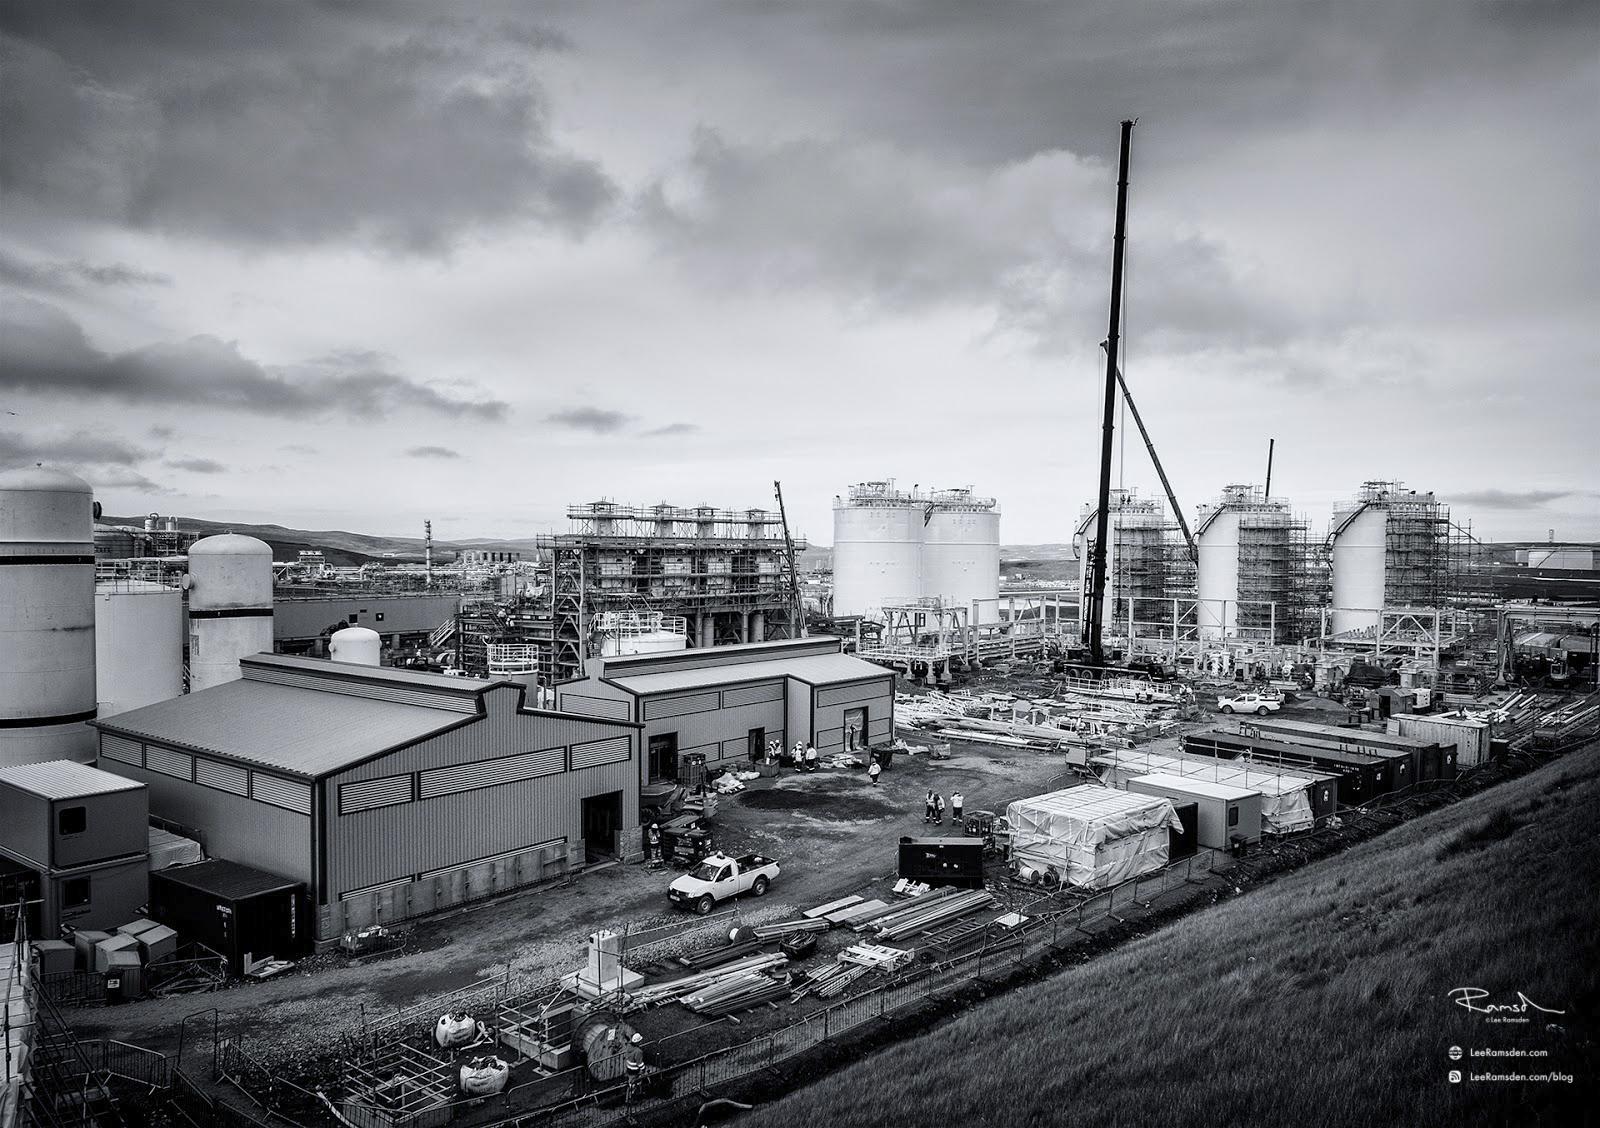 Shetland gas plant construction crane work in progress